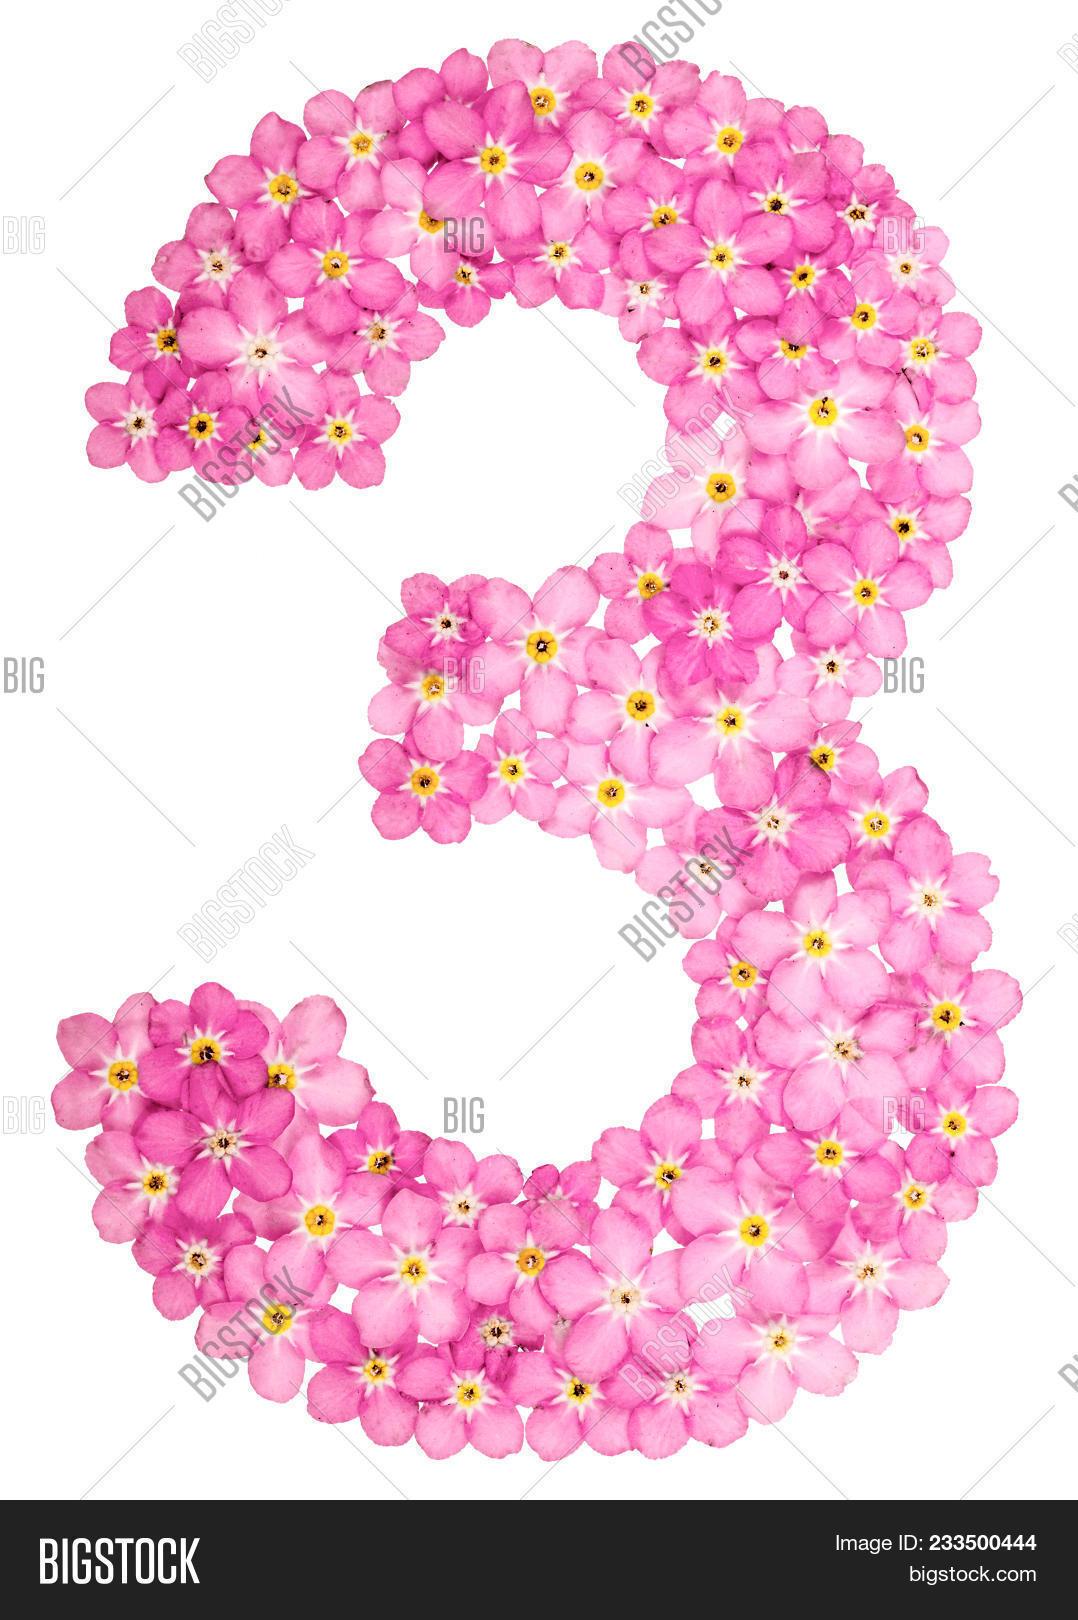 Arabic Numeral 3 Image Photo Free Trial Bigstock